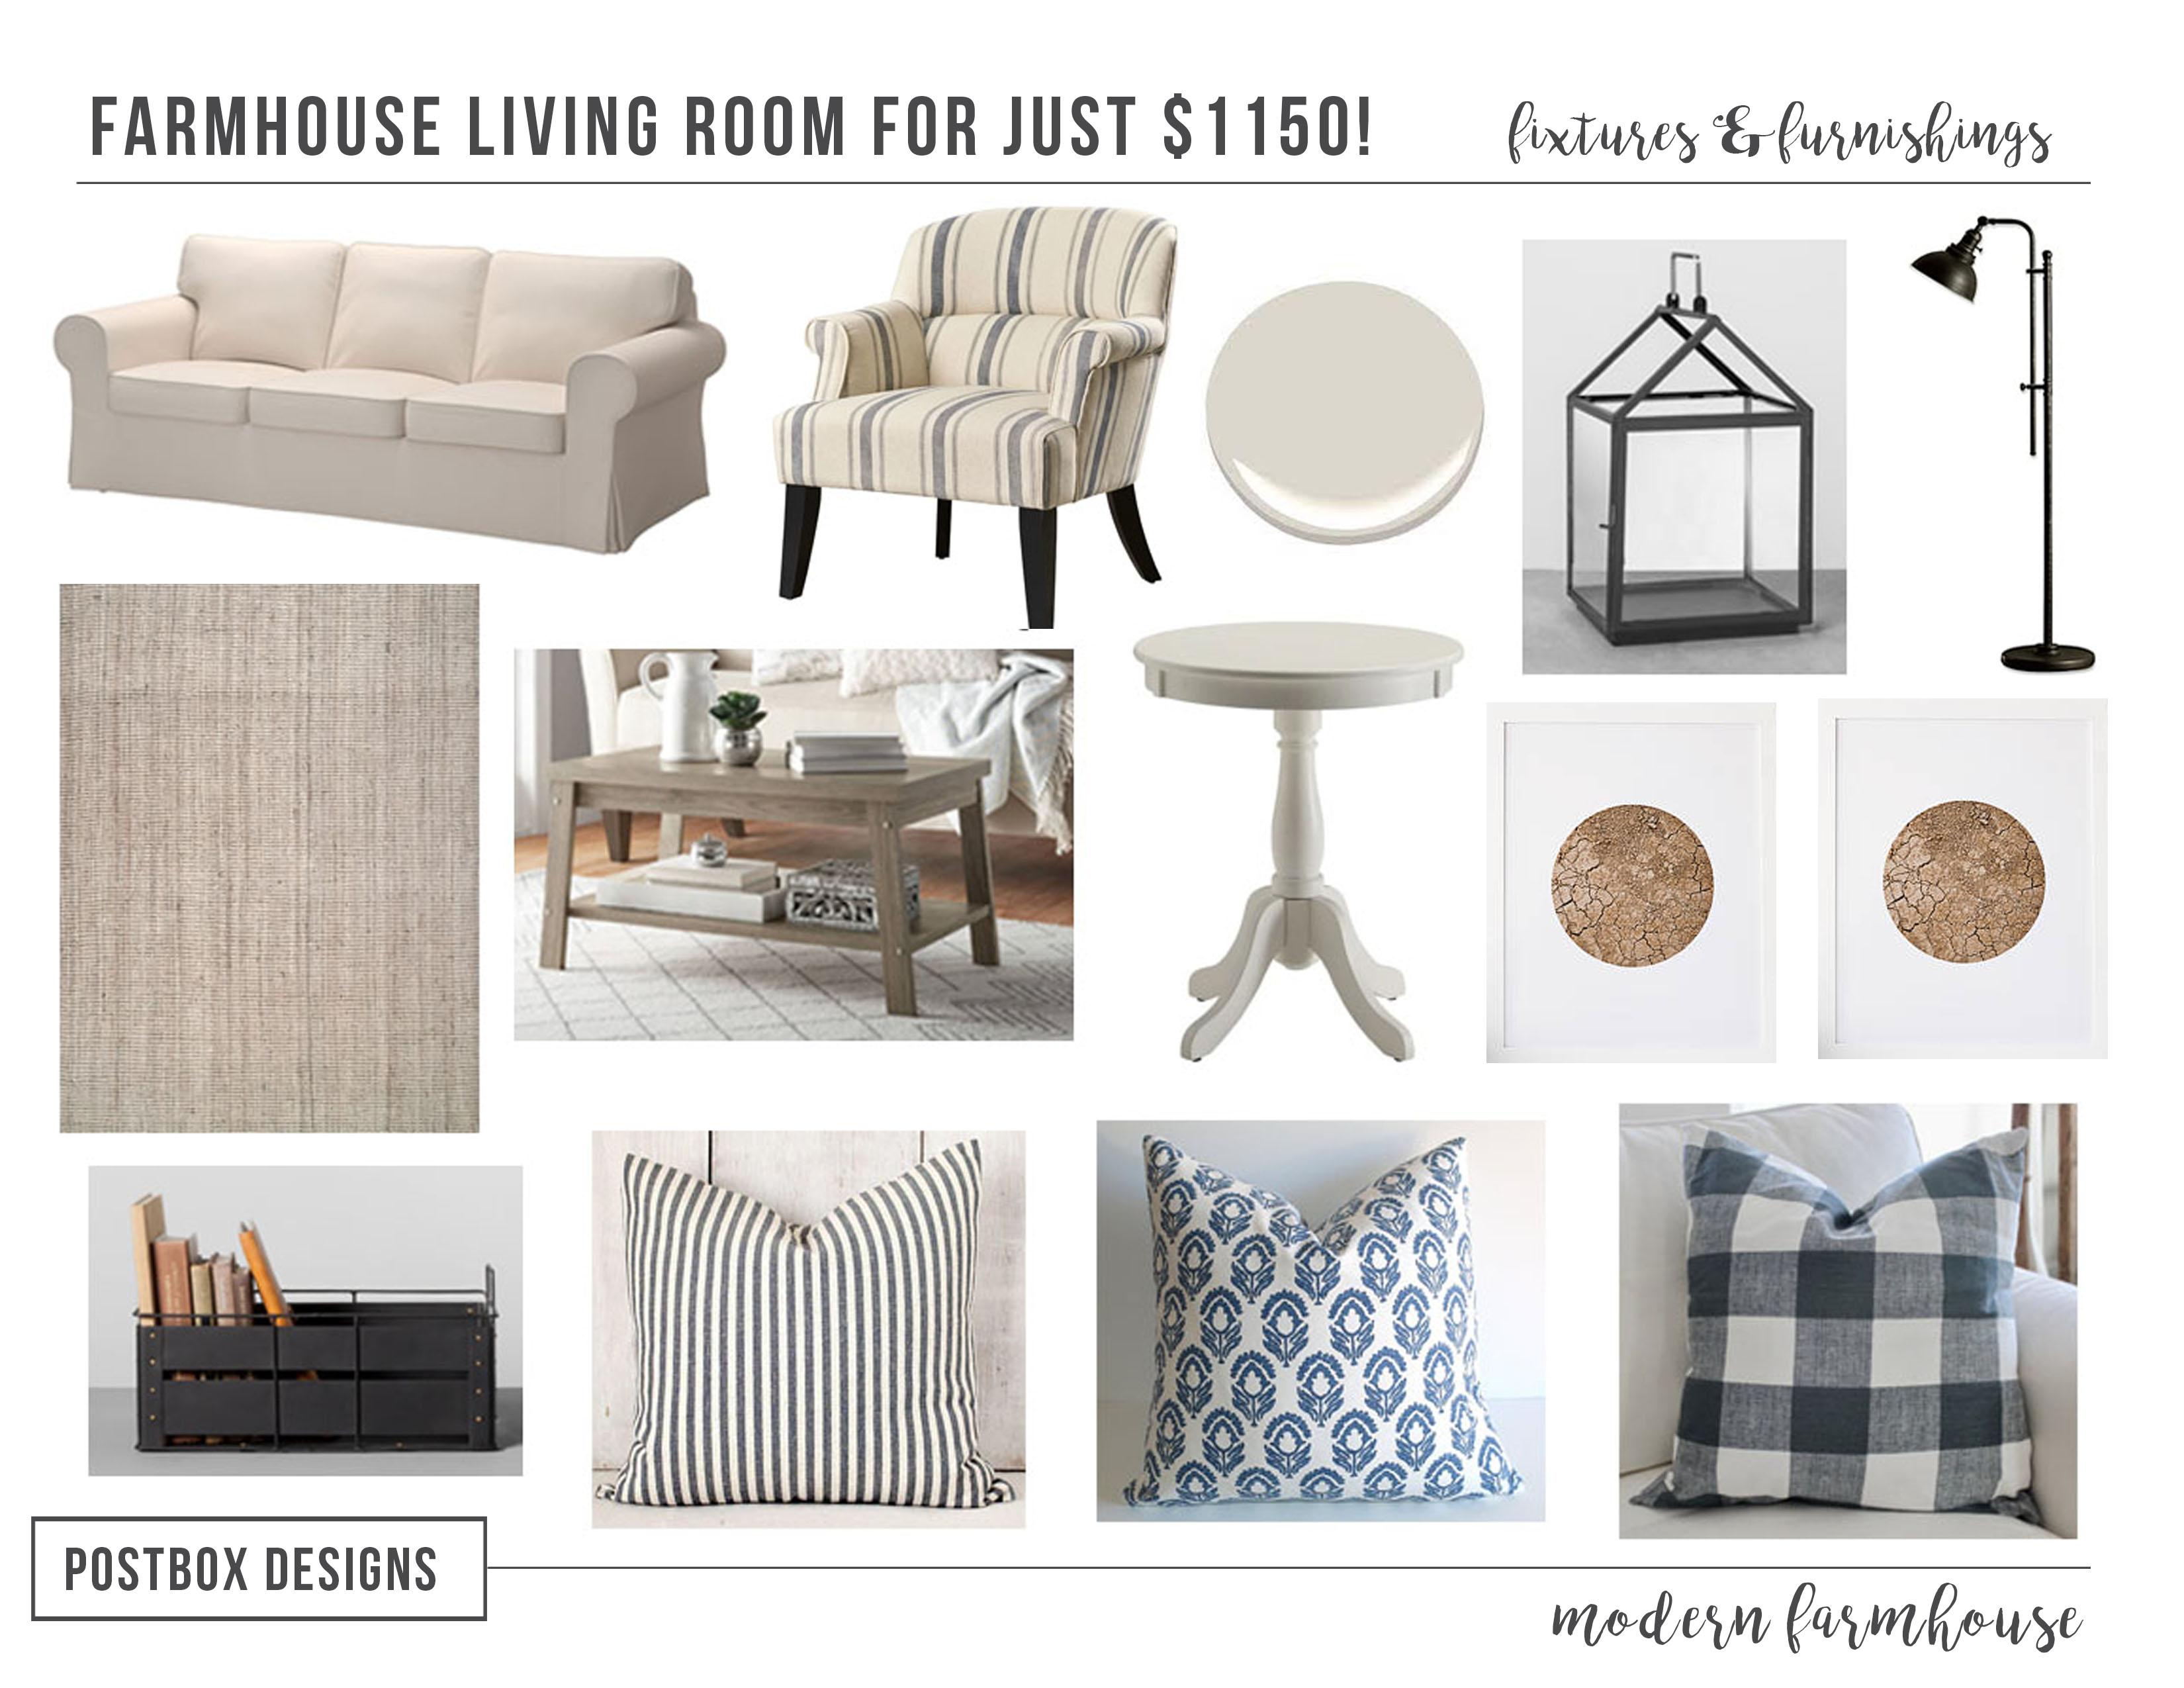 Postbox Designs Interior E Design: Get The Look: $1150 Farmhouse Living  Room Design